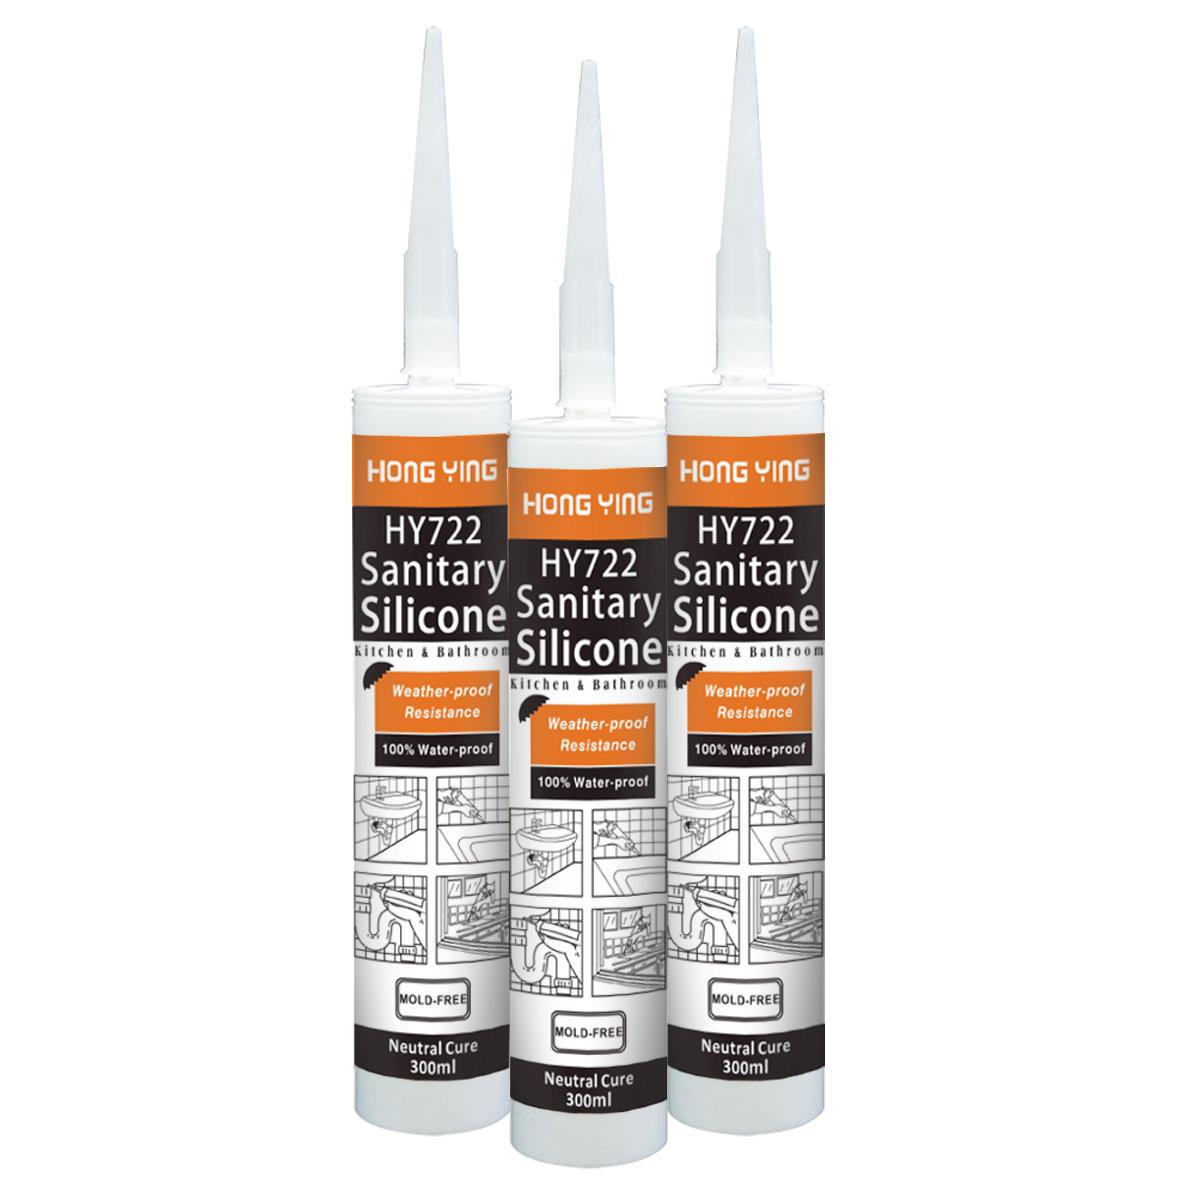 Waterproof Anti-fungus Sanitary Silicone Sealant